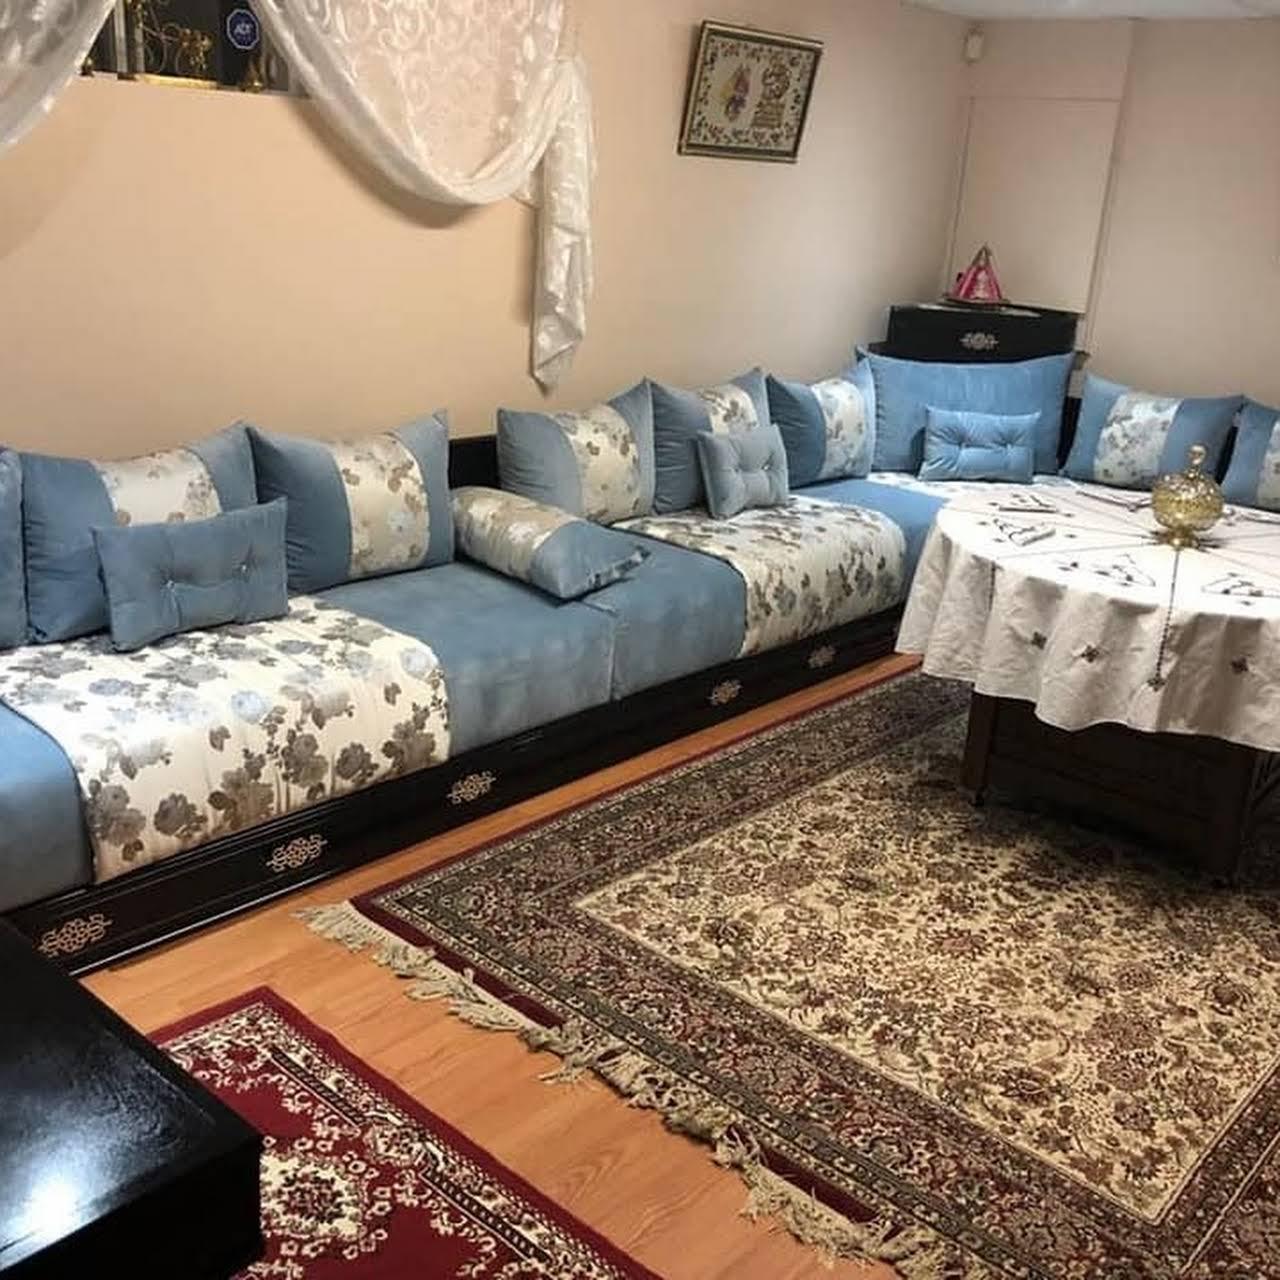 Salon Marocain Lala Molaty inc - Meubles salon marocain